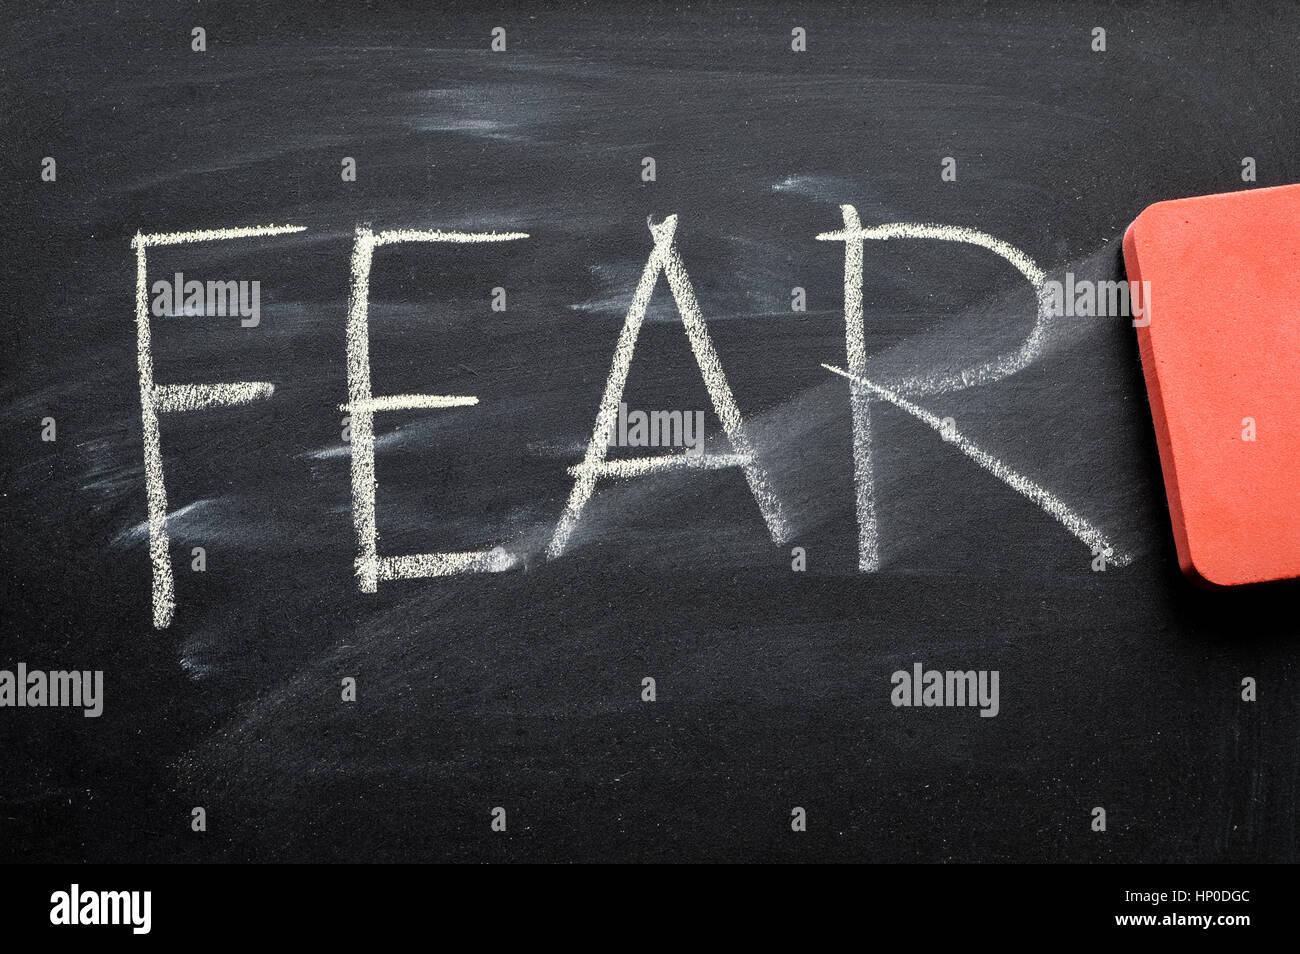 erasing fear, hand written word on blackboard being erased concept - Stock Image